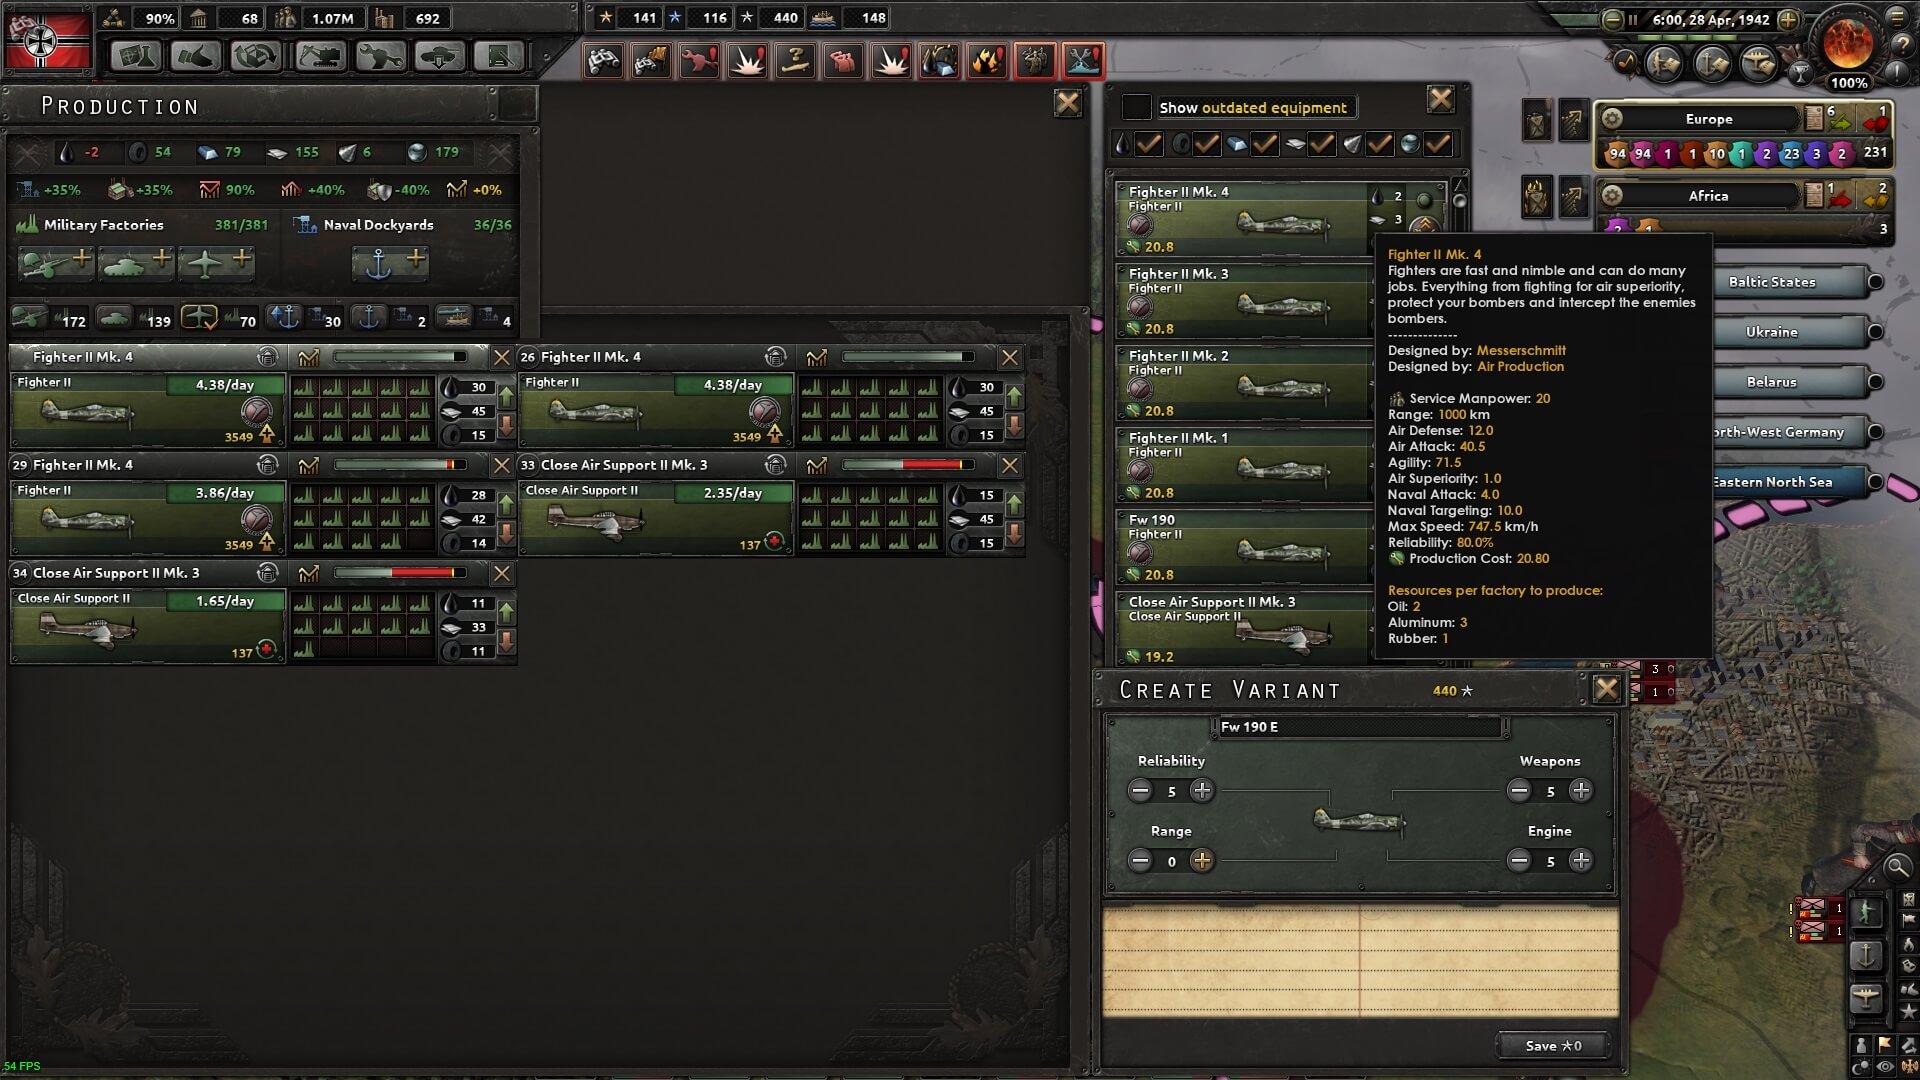 Hearts of Iron IV - Экспертный ИИ 4.0